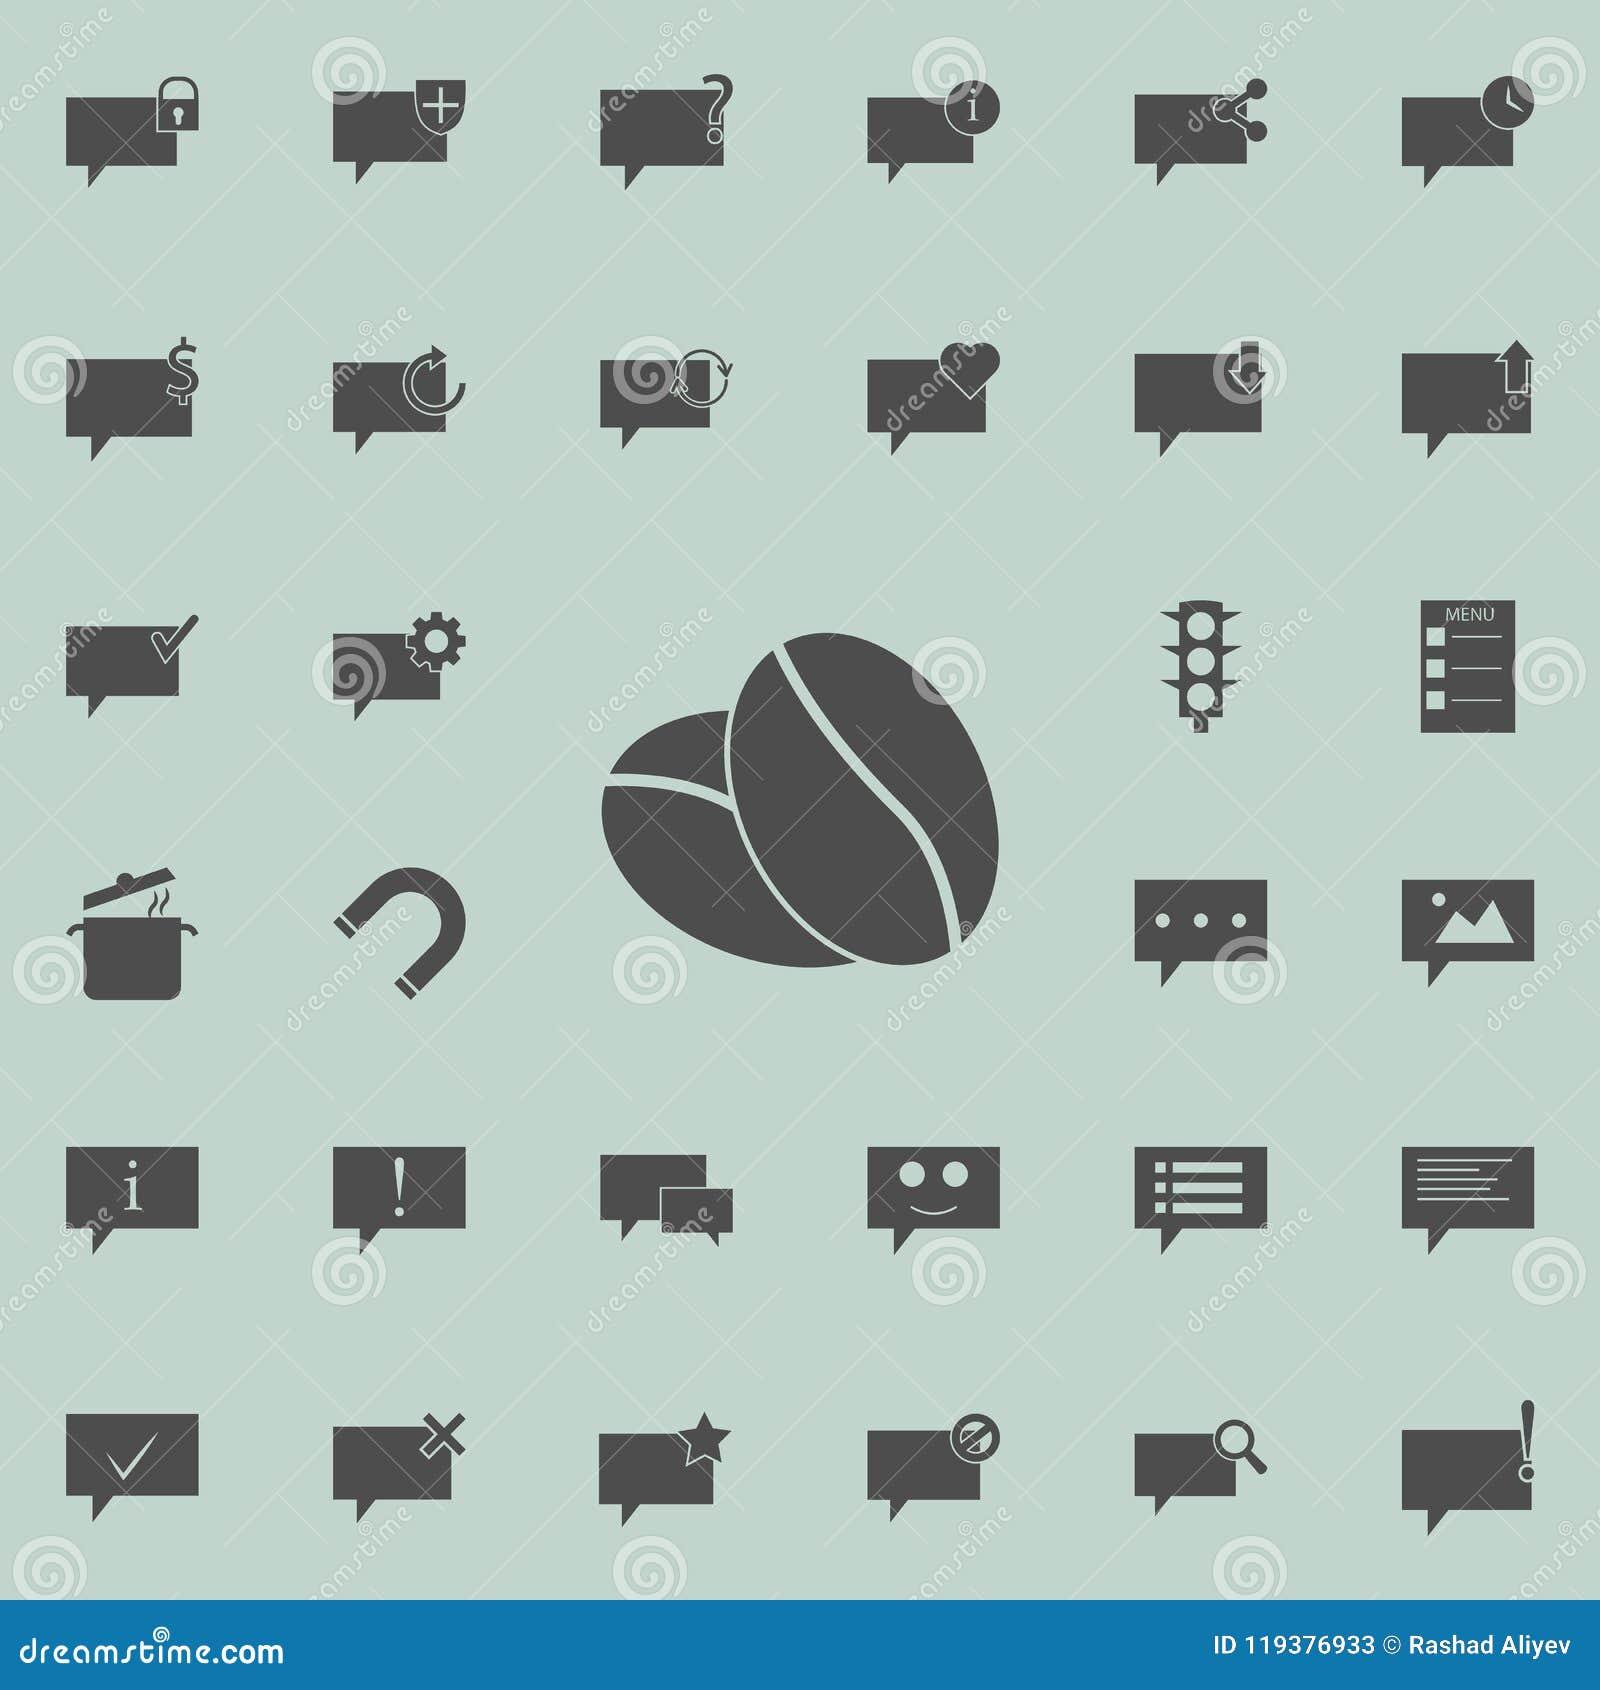 Coffee Beans Icon Detailed Set Of Minimalistic Icons Premium